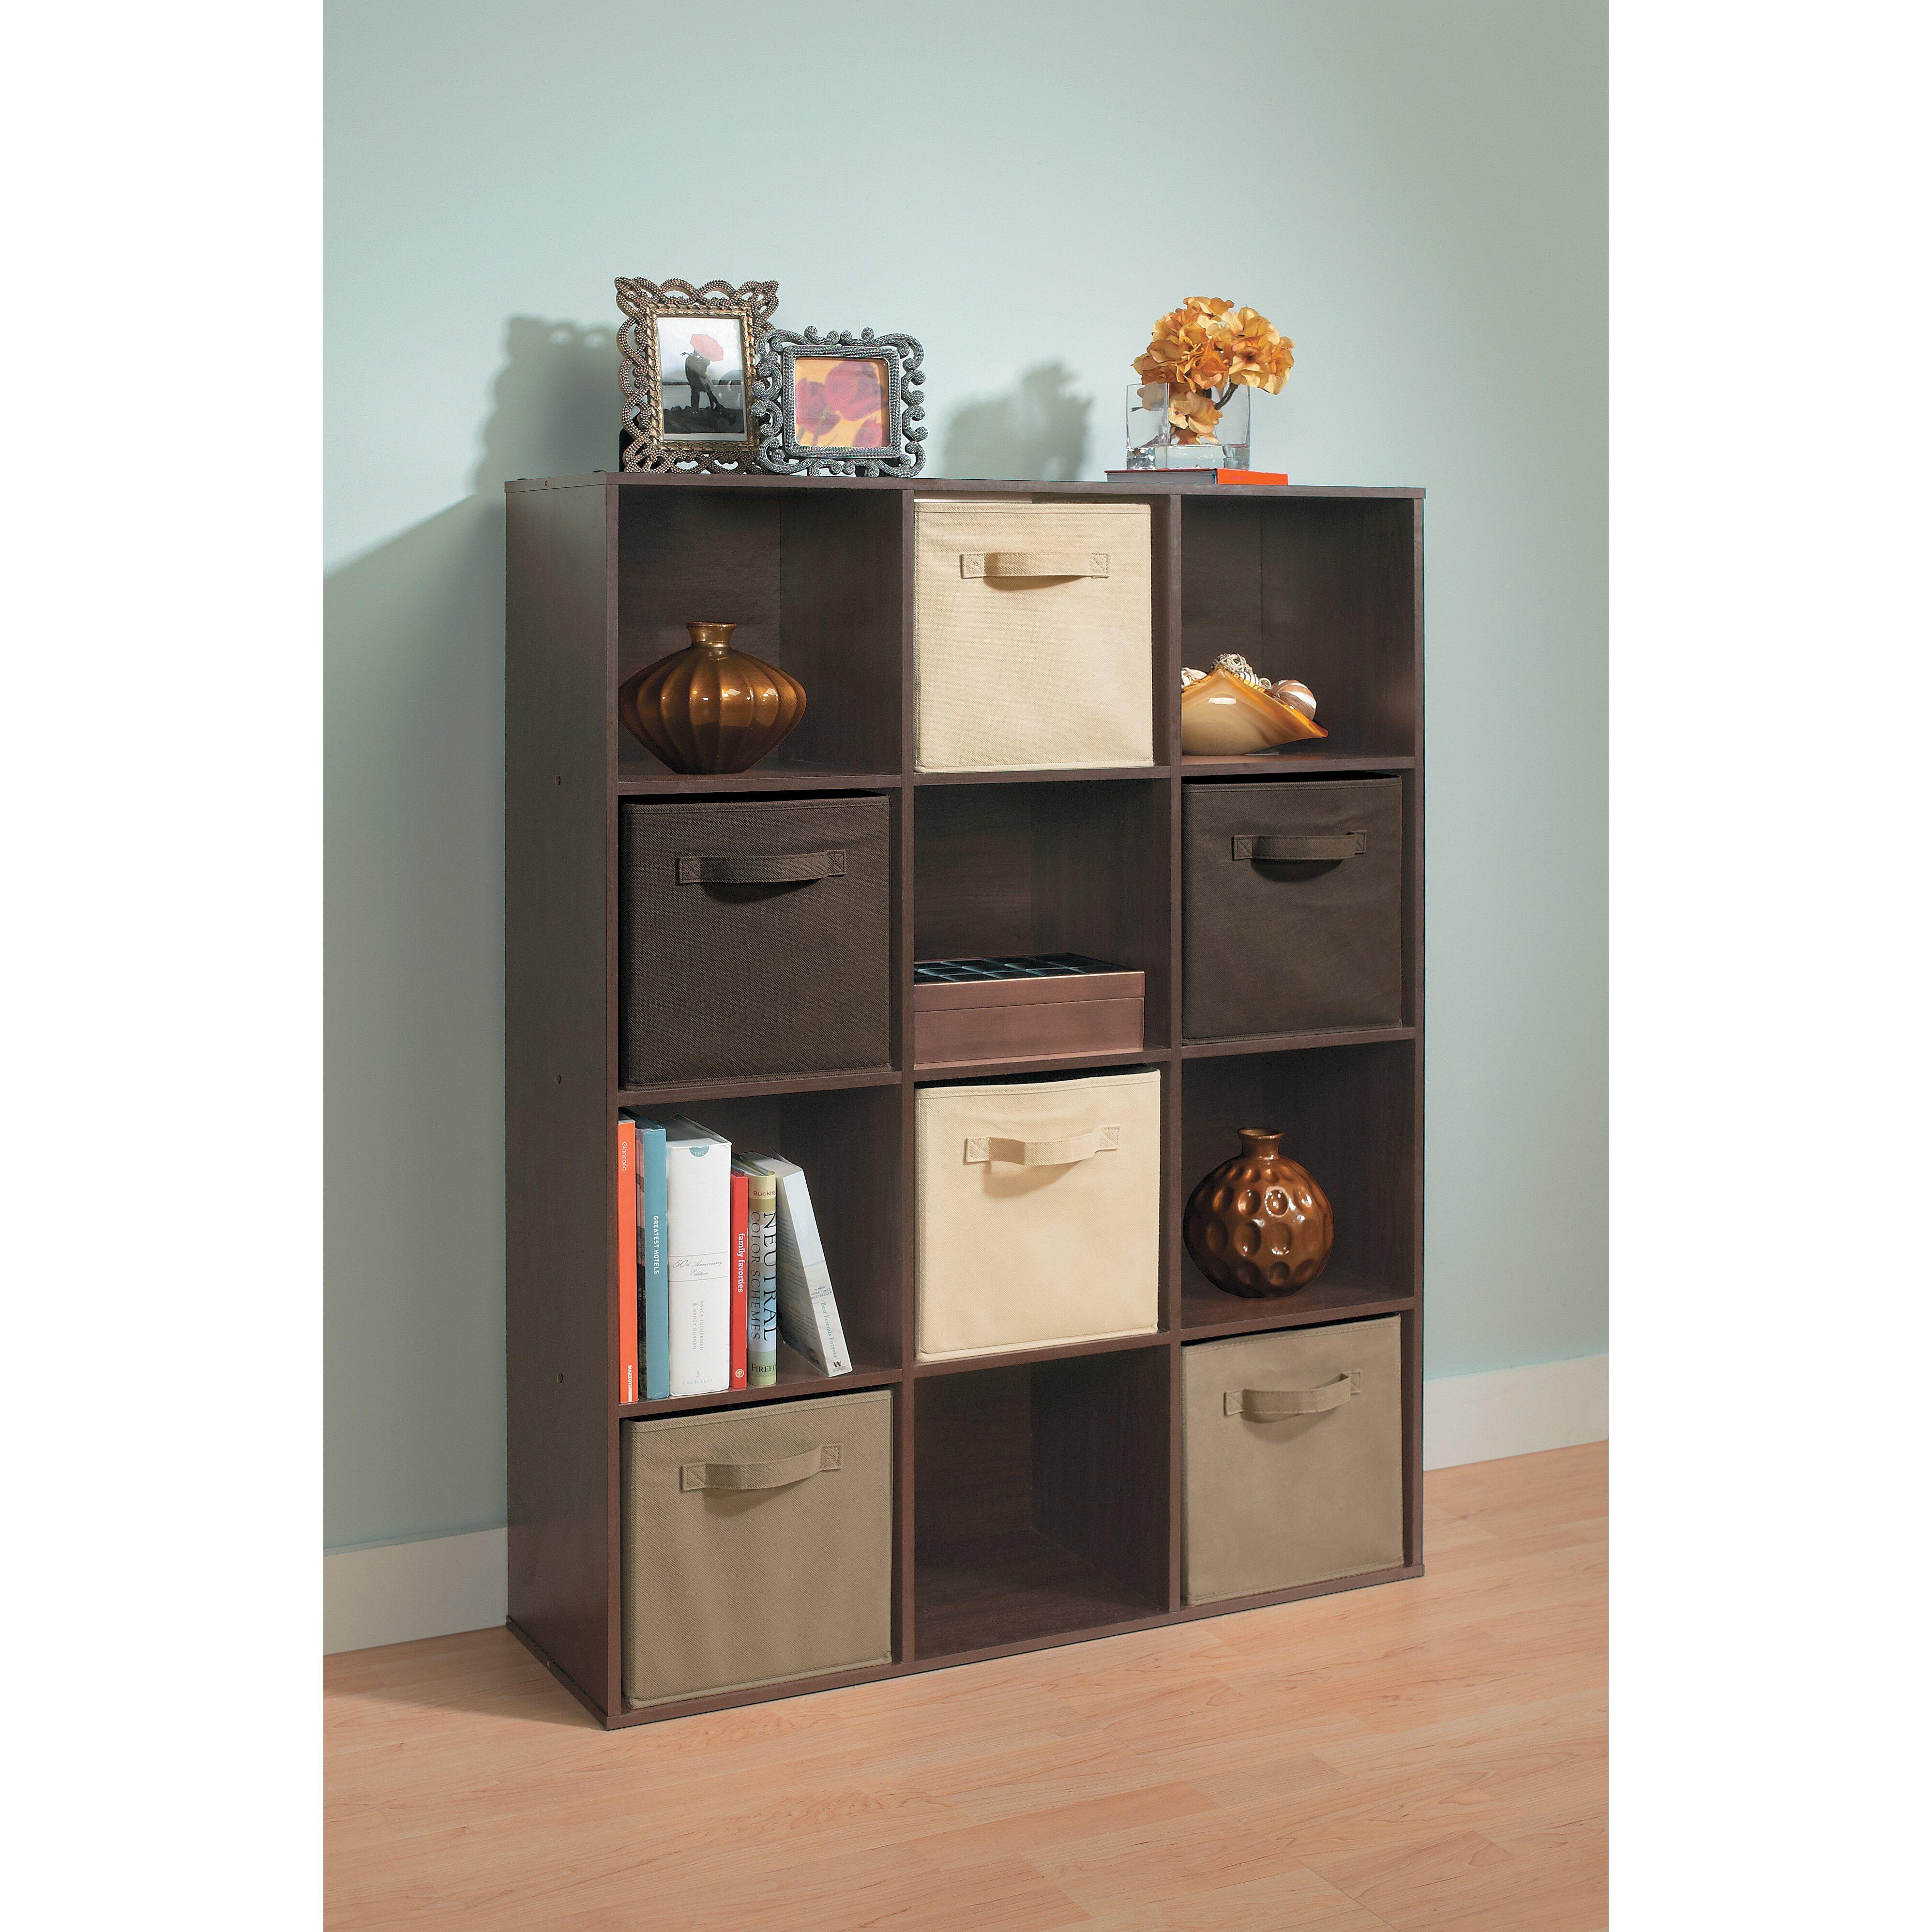 "ClosetMaid Cubeicals 35"" Cube Unit Bookcase & Reviews ..."